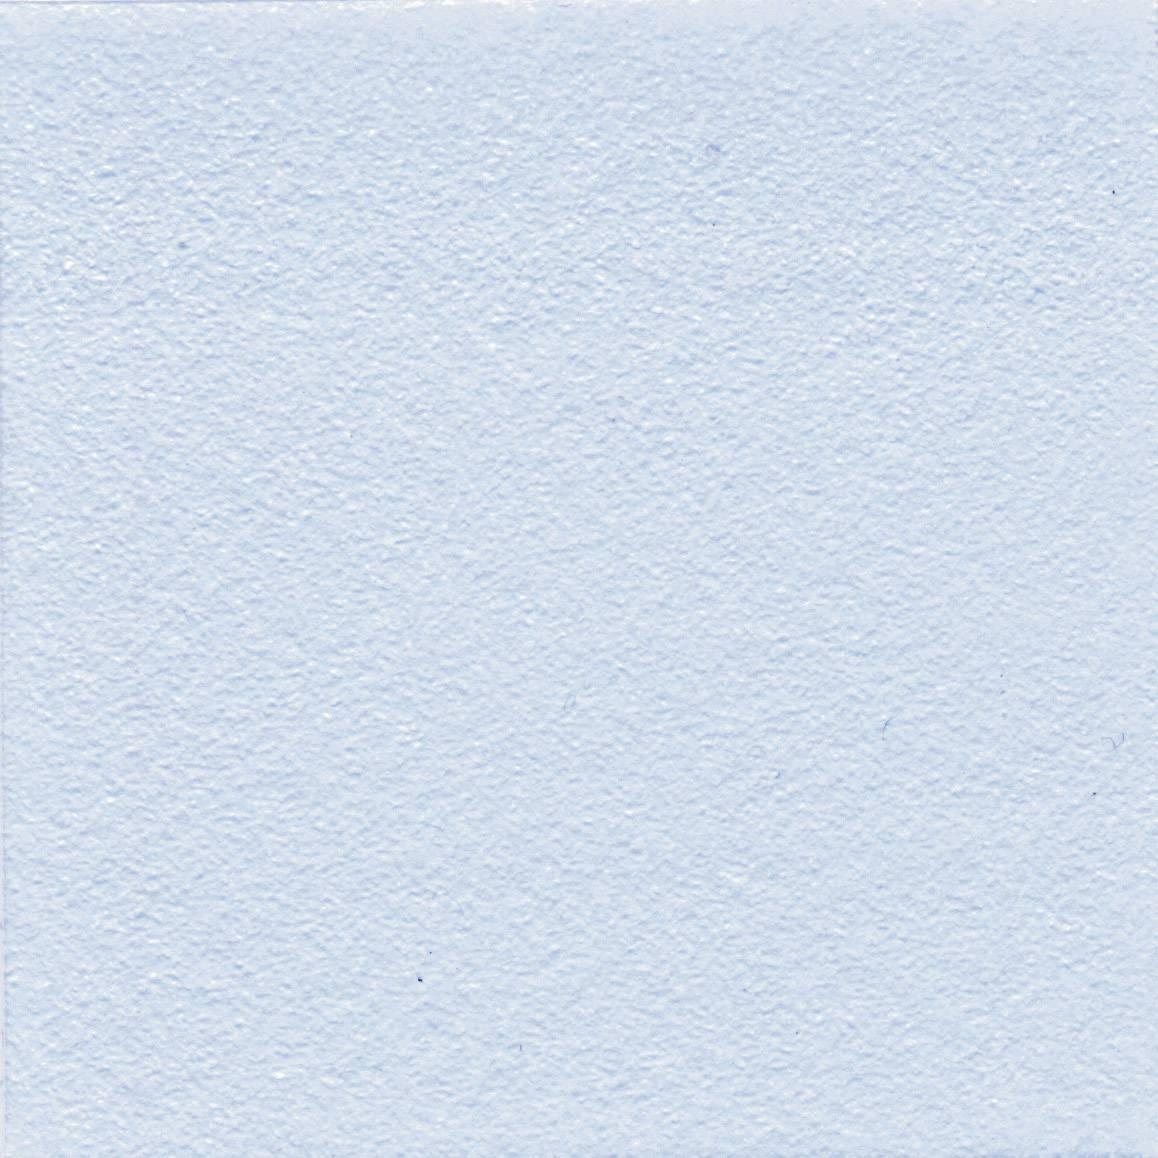 Teplovodivá fólia Kerafol SOFTTHERM 86/300, 2 mm, 3 W/mK, (d x š) 50 mm x 50 mm